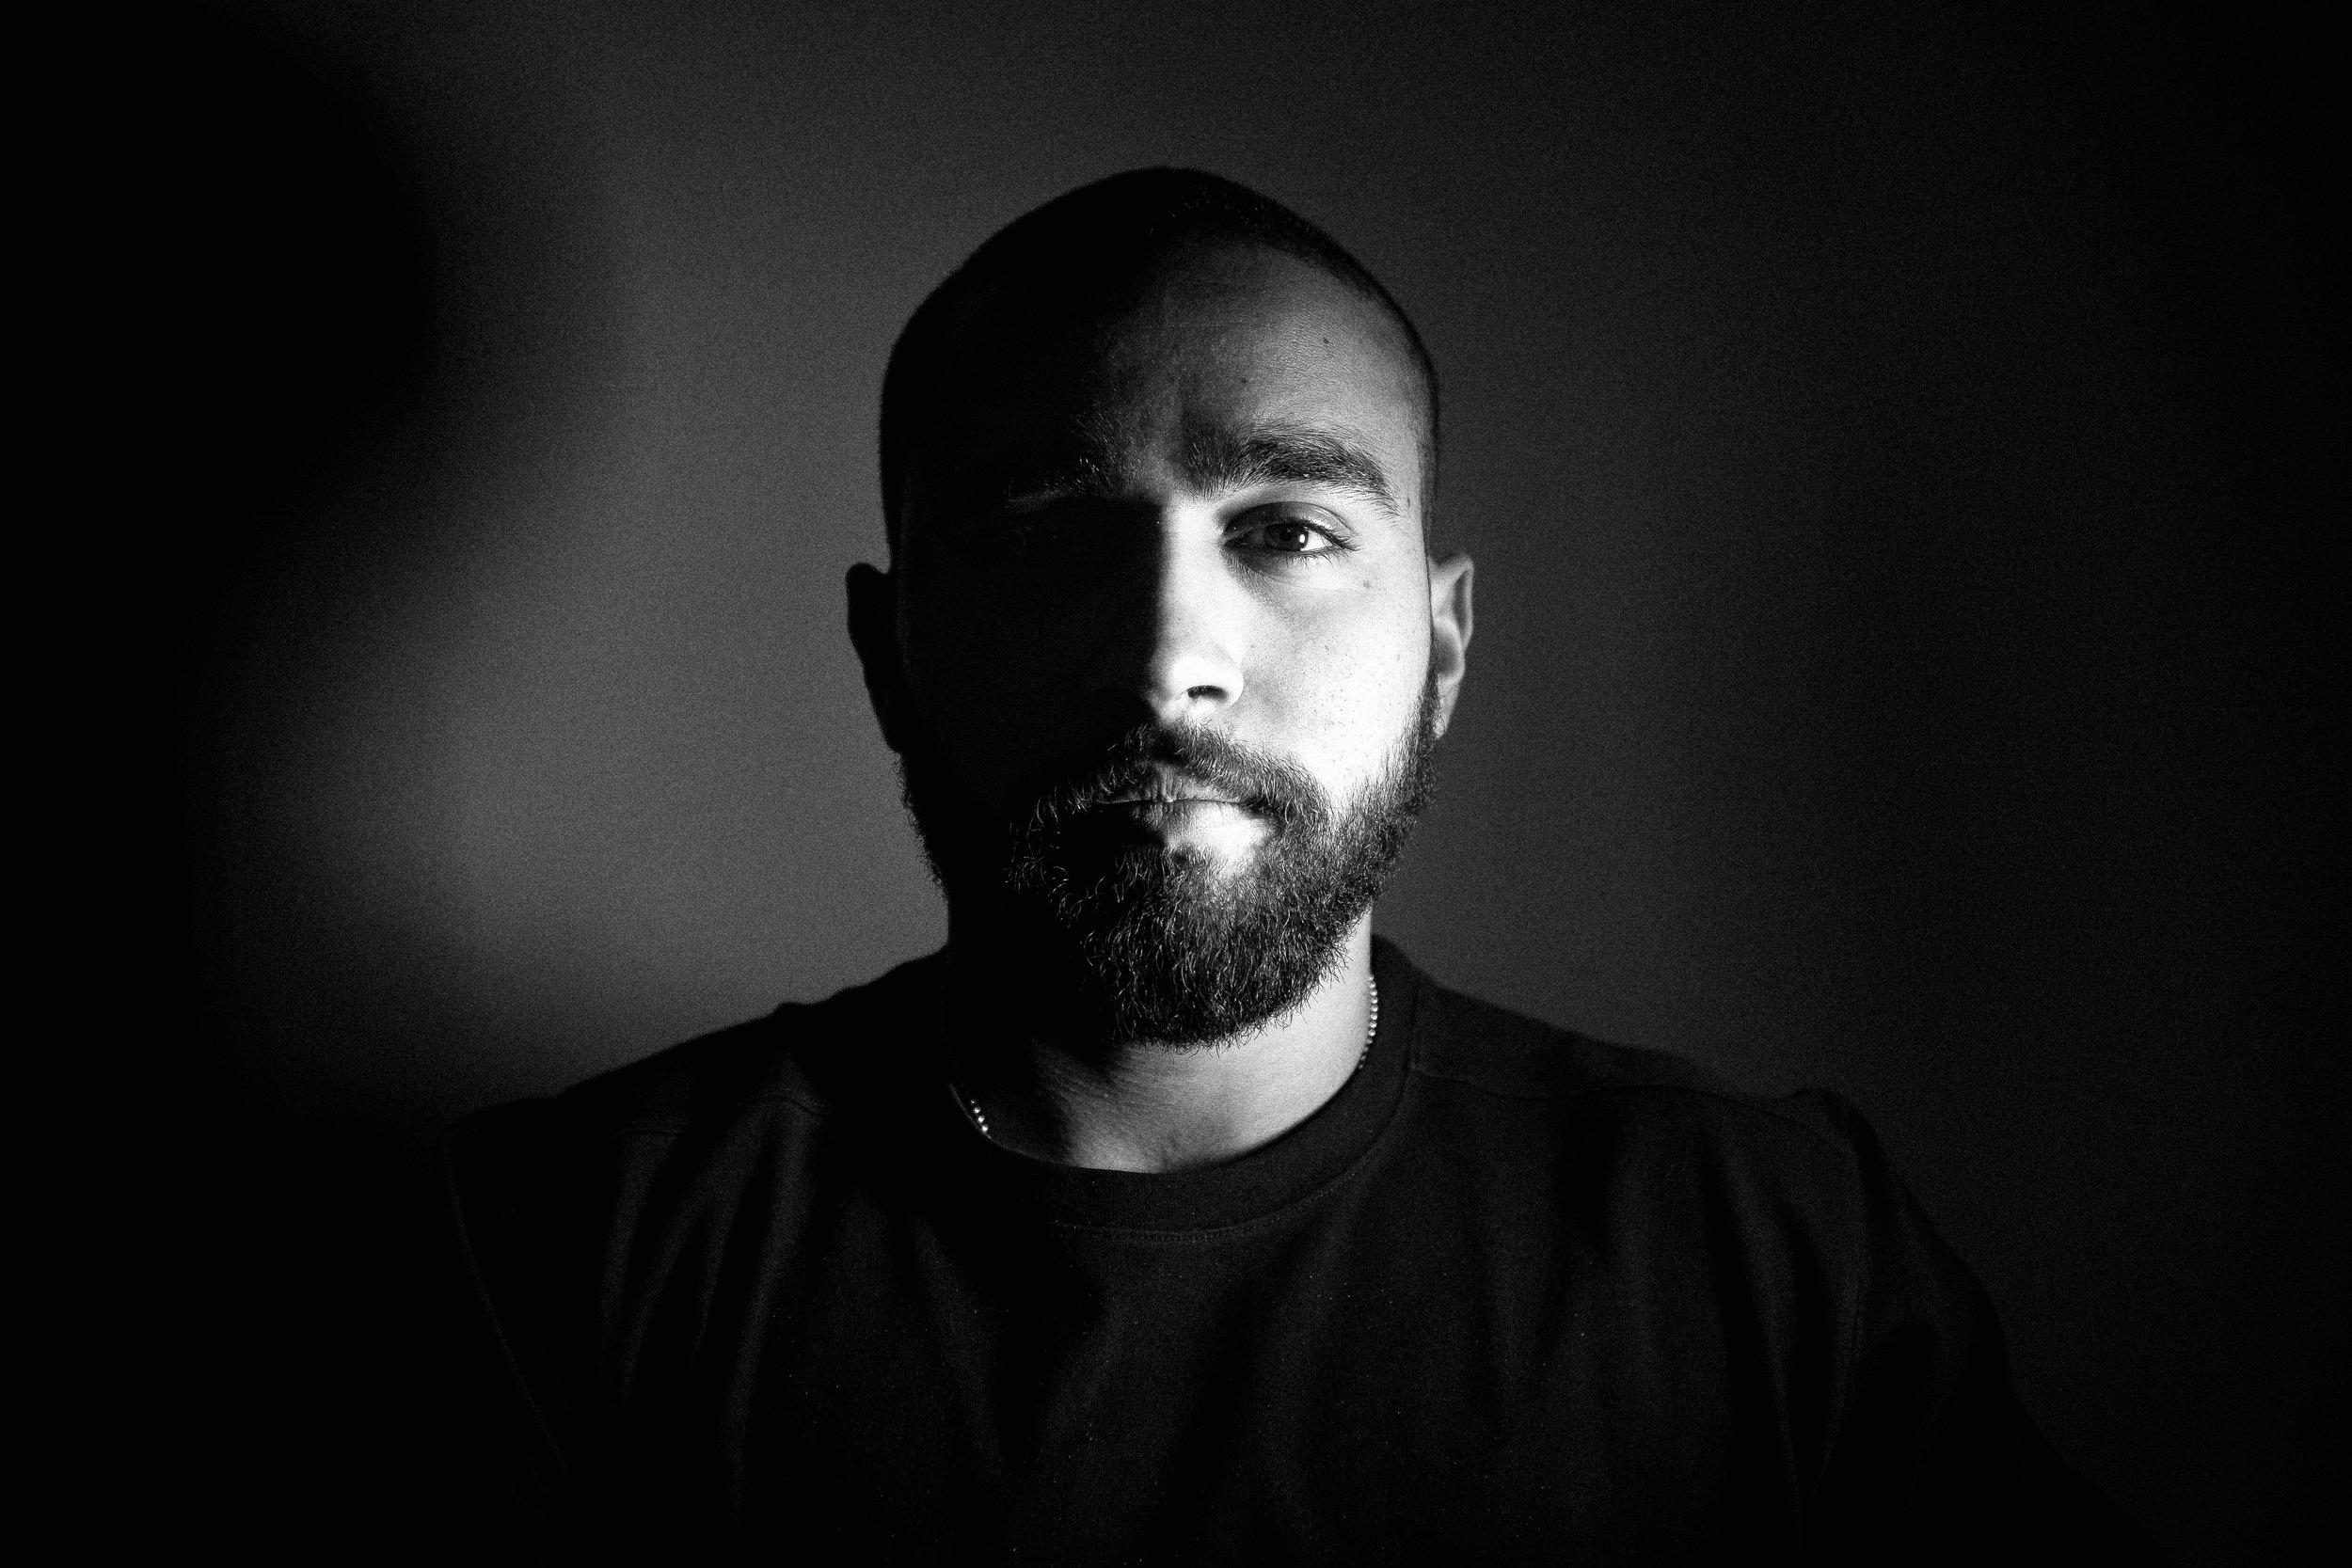 Yassin Montasser Portrait.jpg